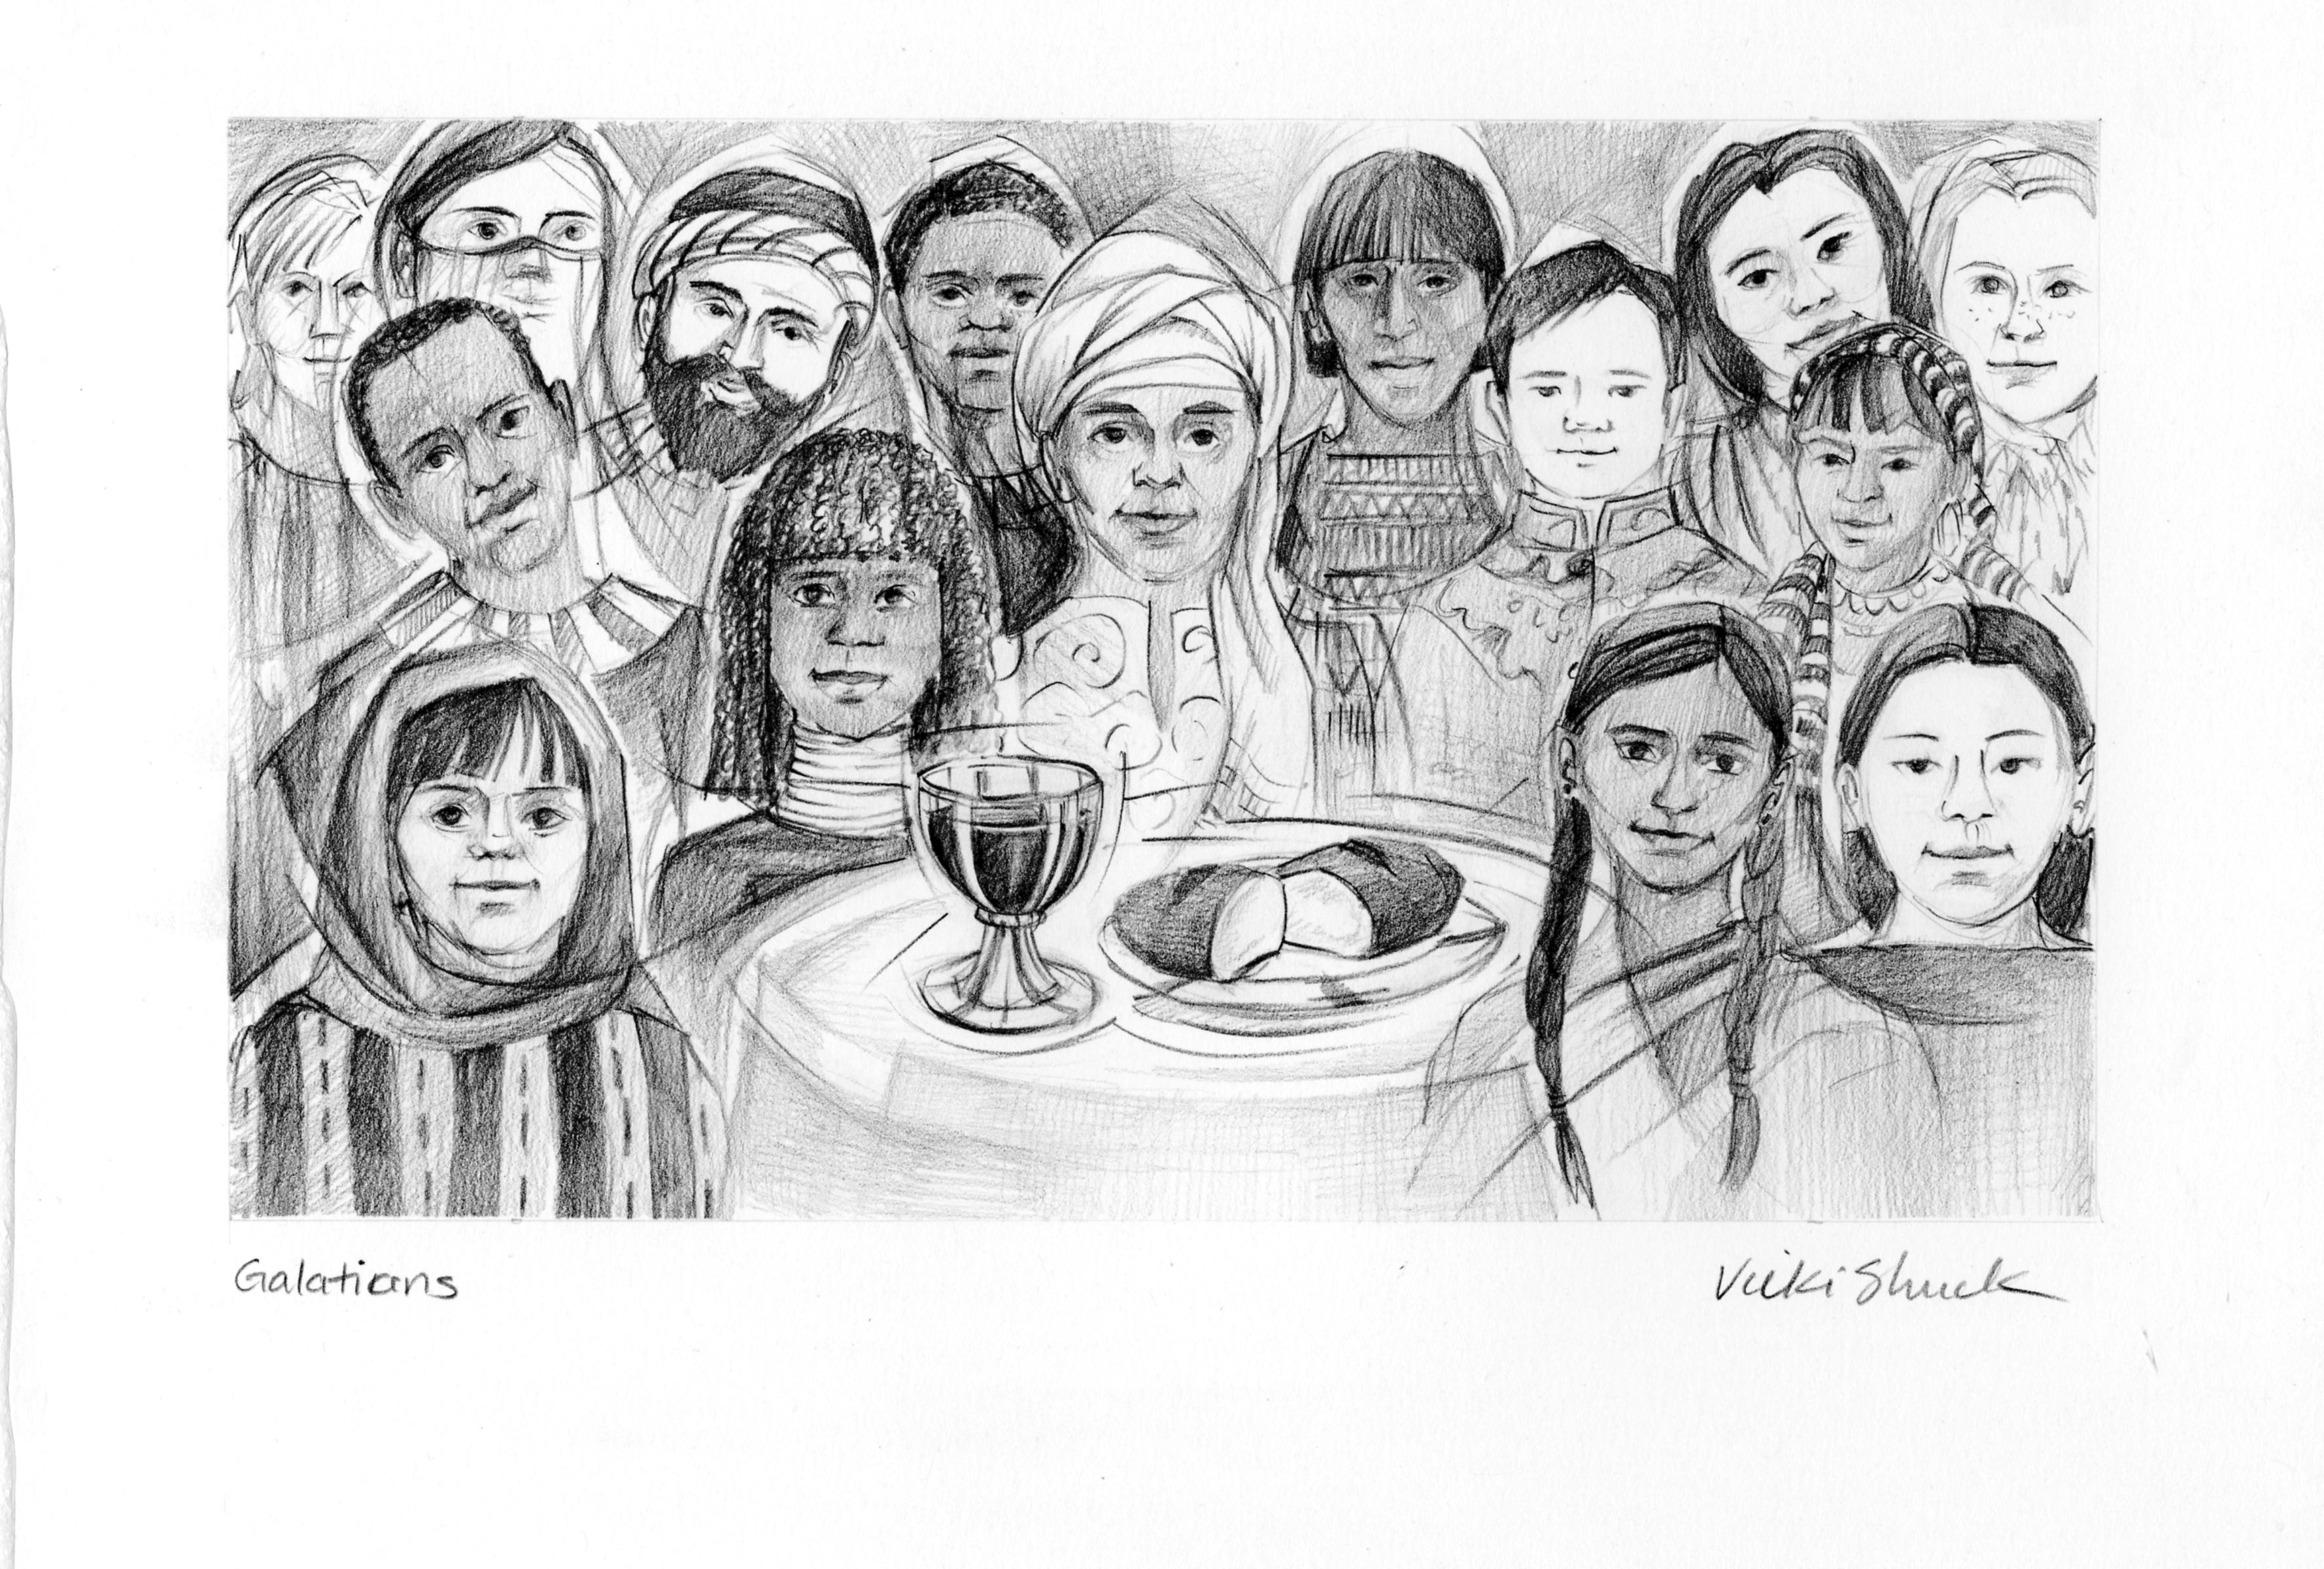 Galations 3 28 Illustration